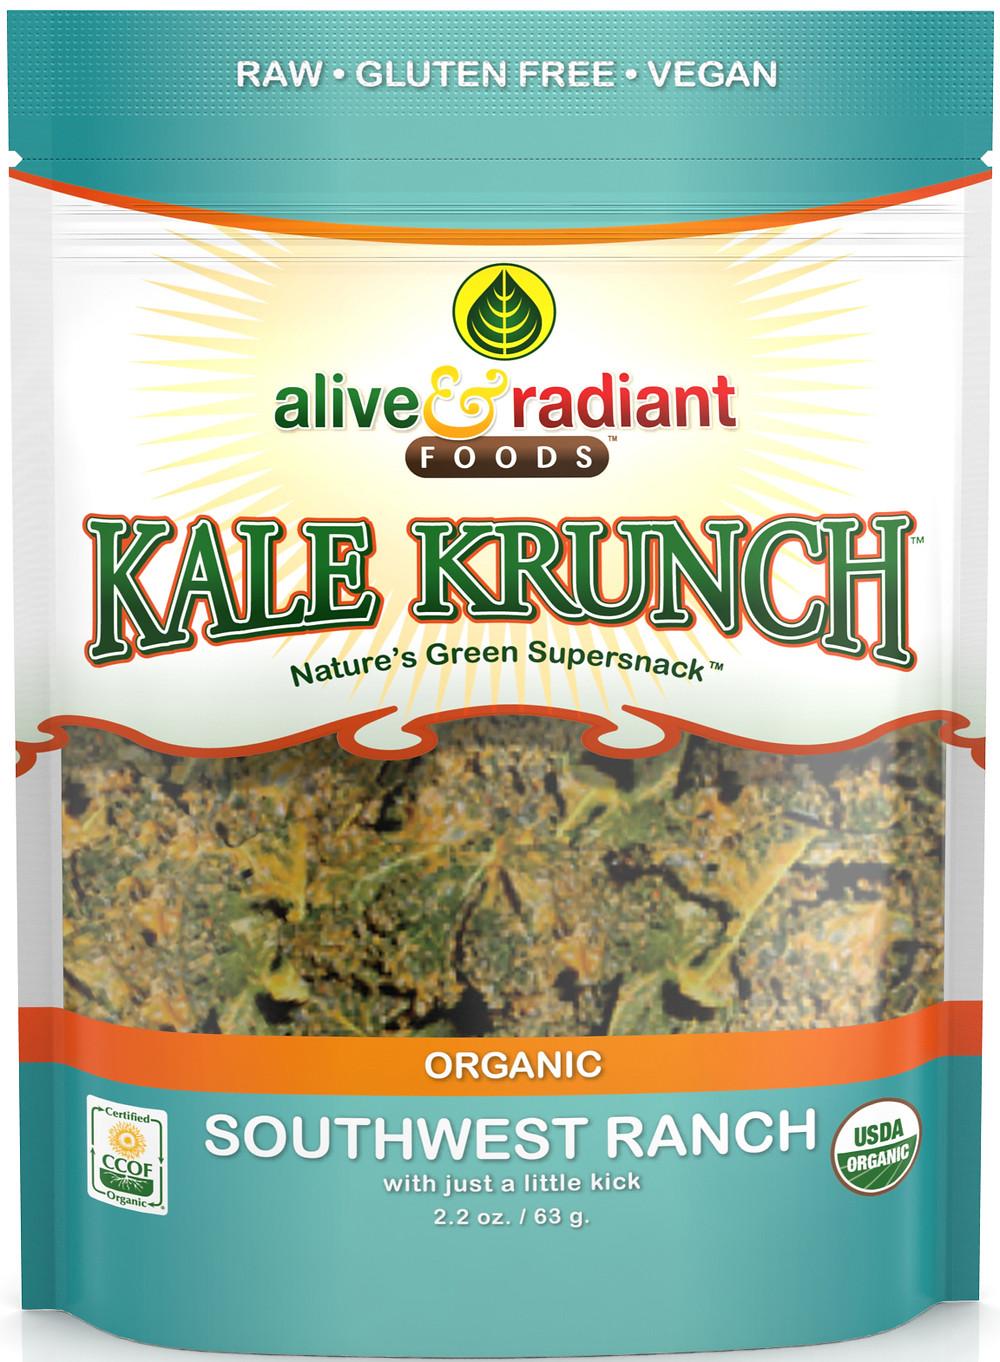 Organic Southwest Ranch Kale Krunch